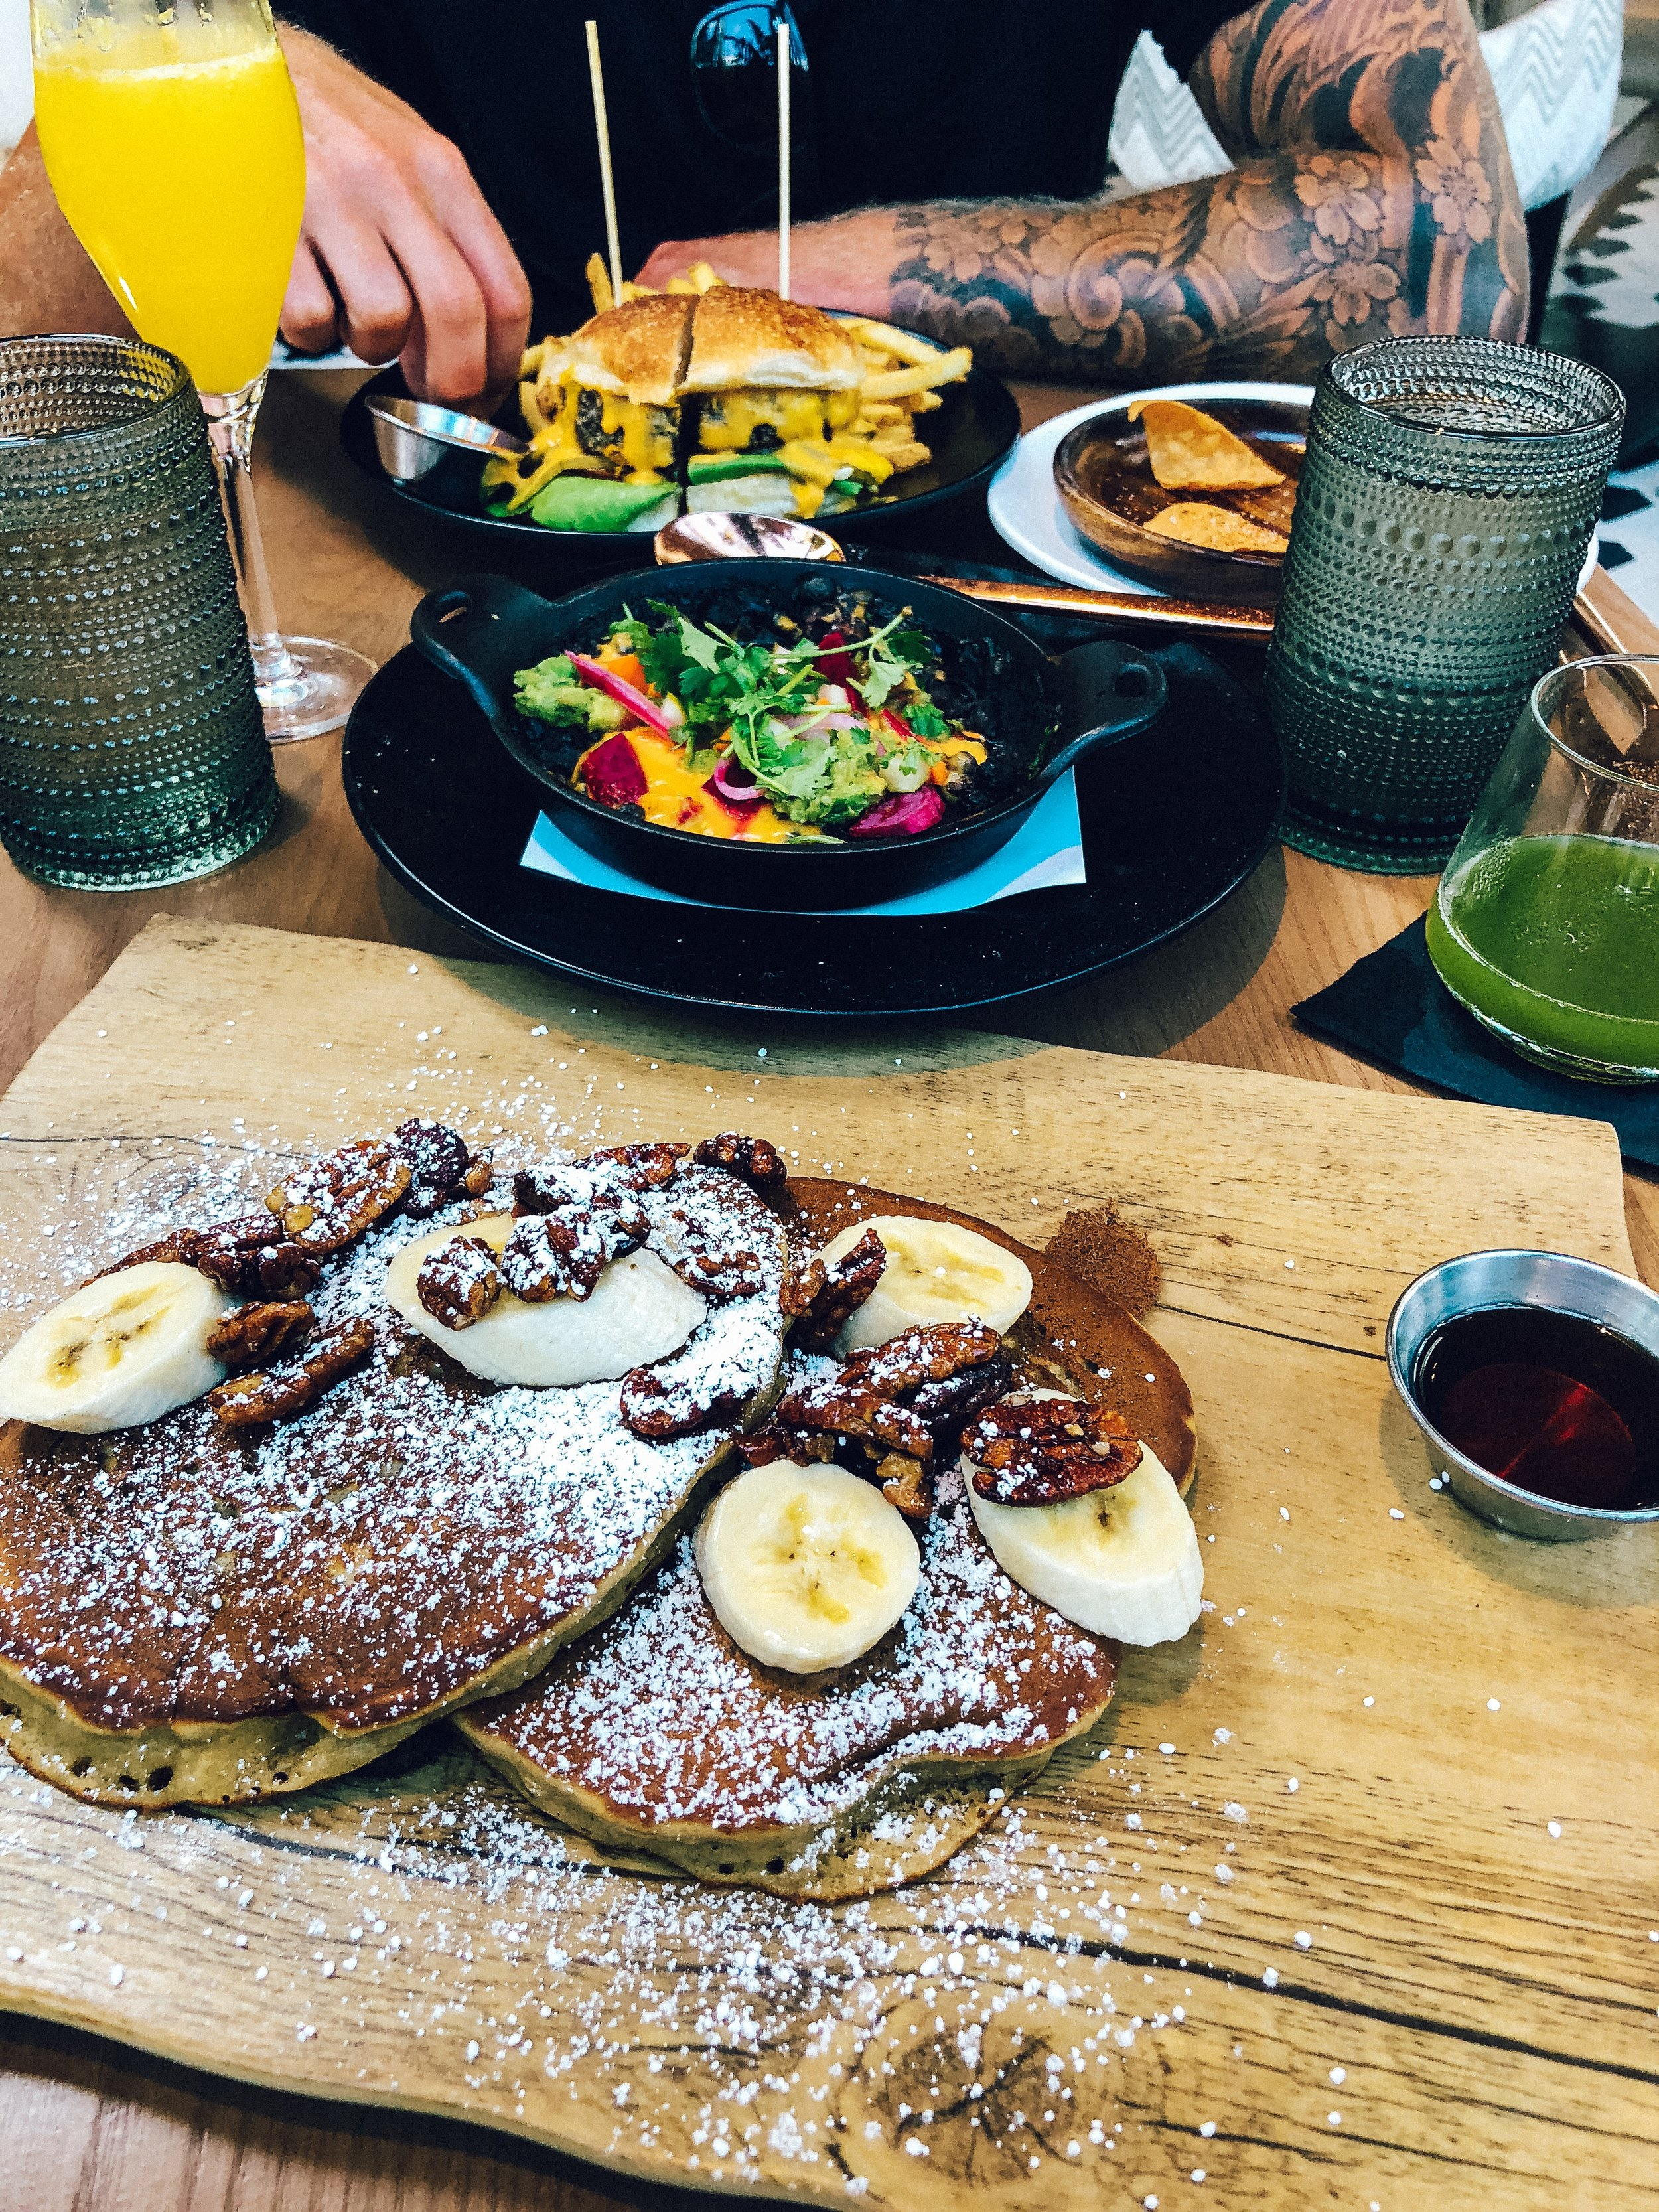 vegan banana pancakes from Planta